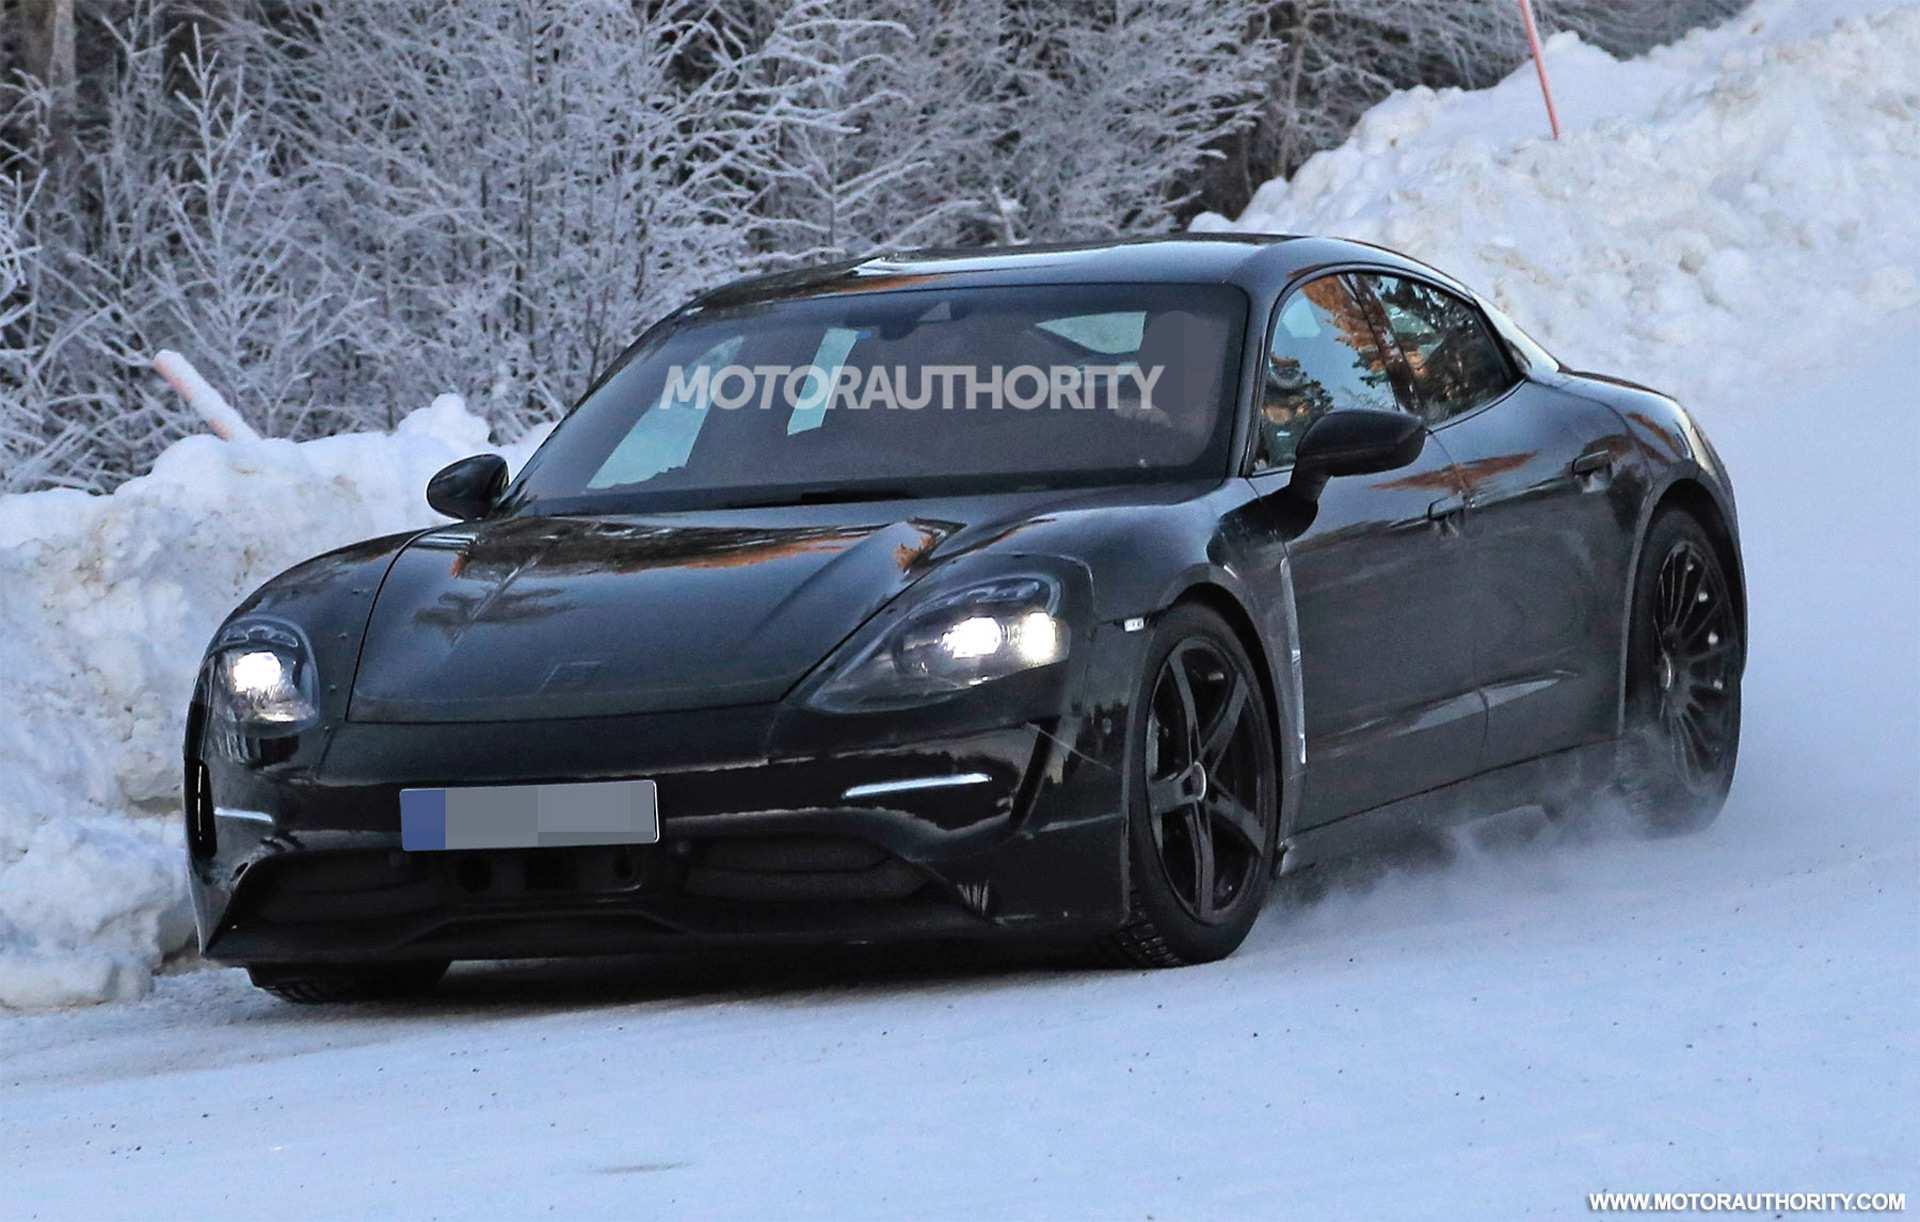 46 All New 2020 Porsche 960 Spesification with 2020 Porsche 960